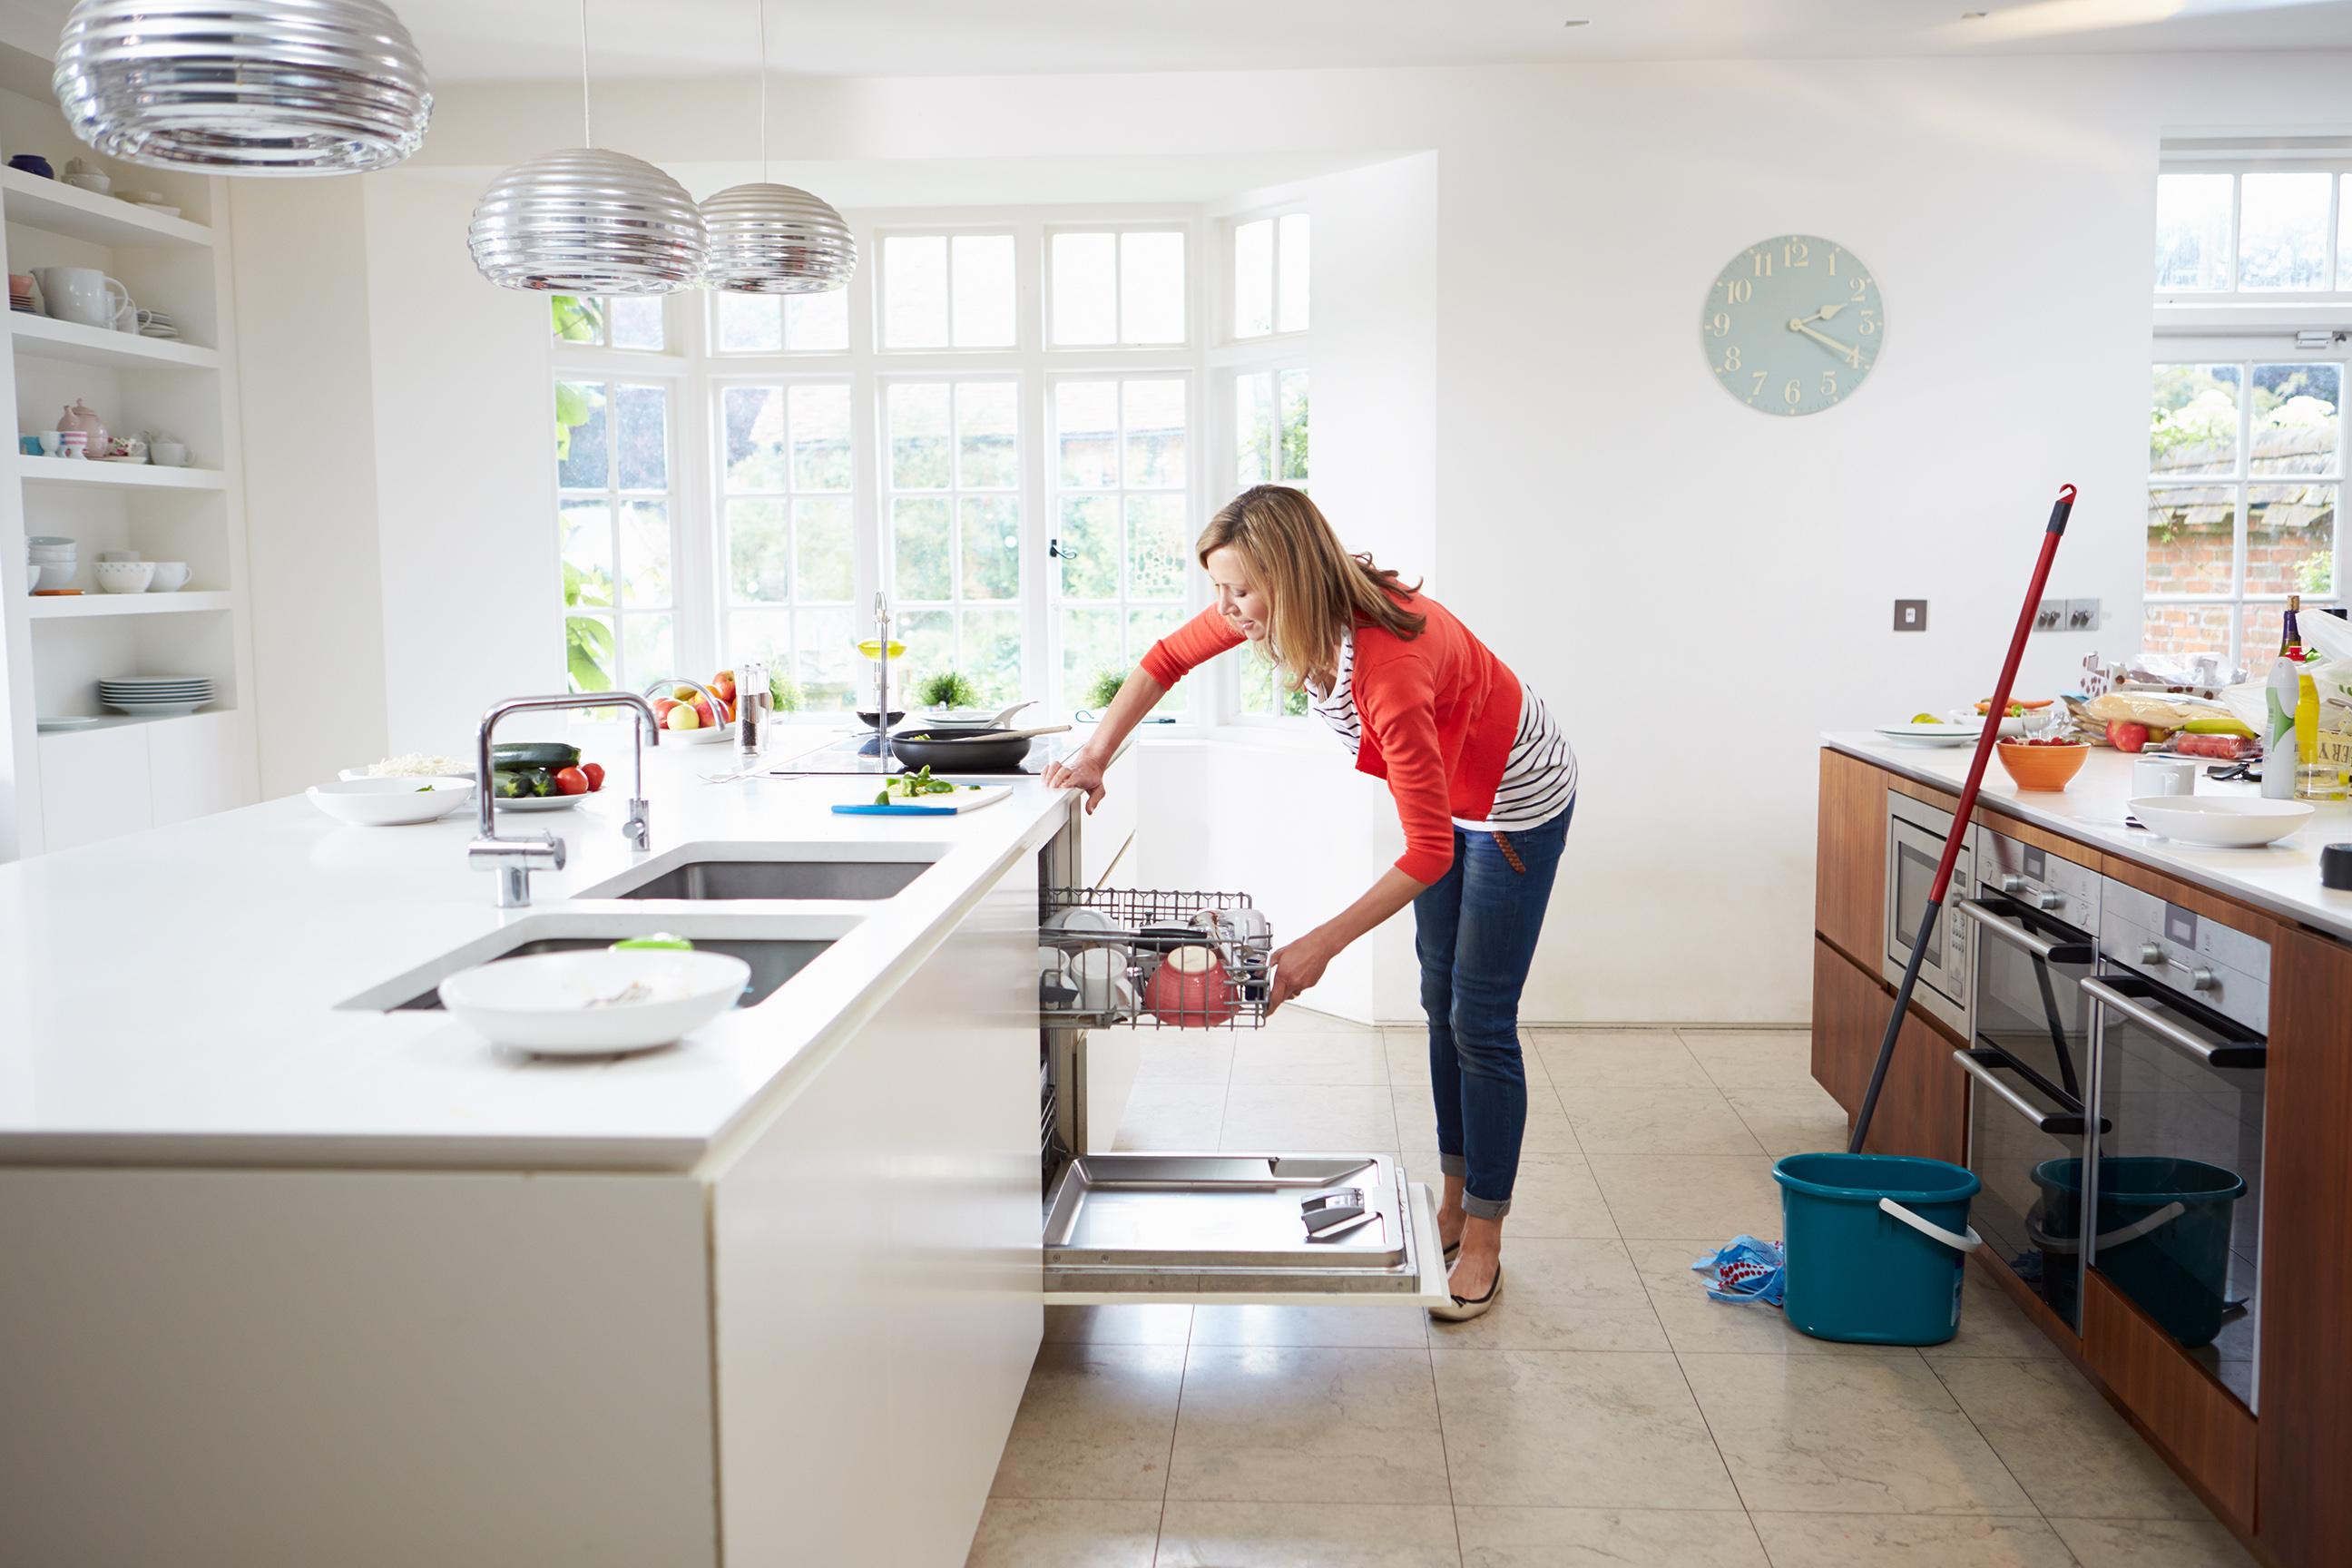 modular kitchen cleaning